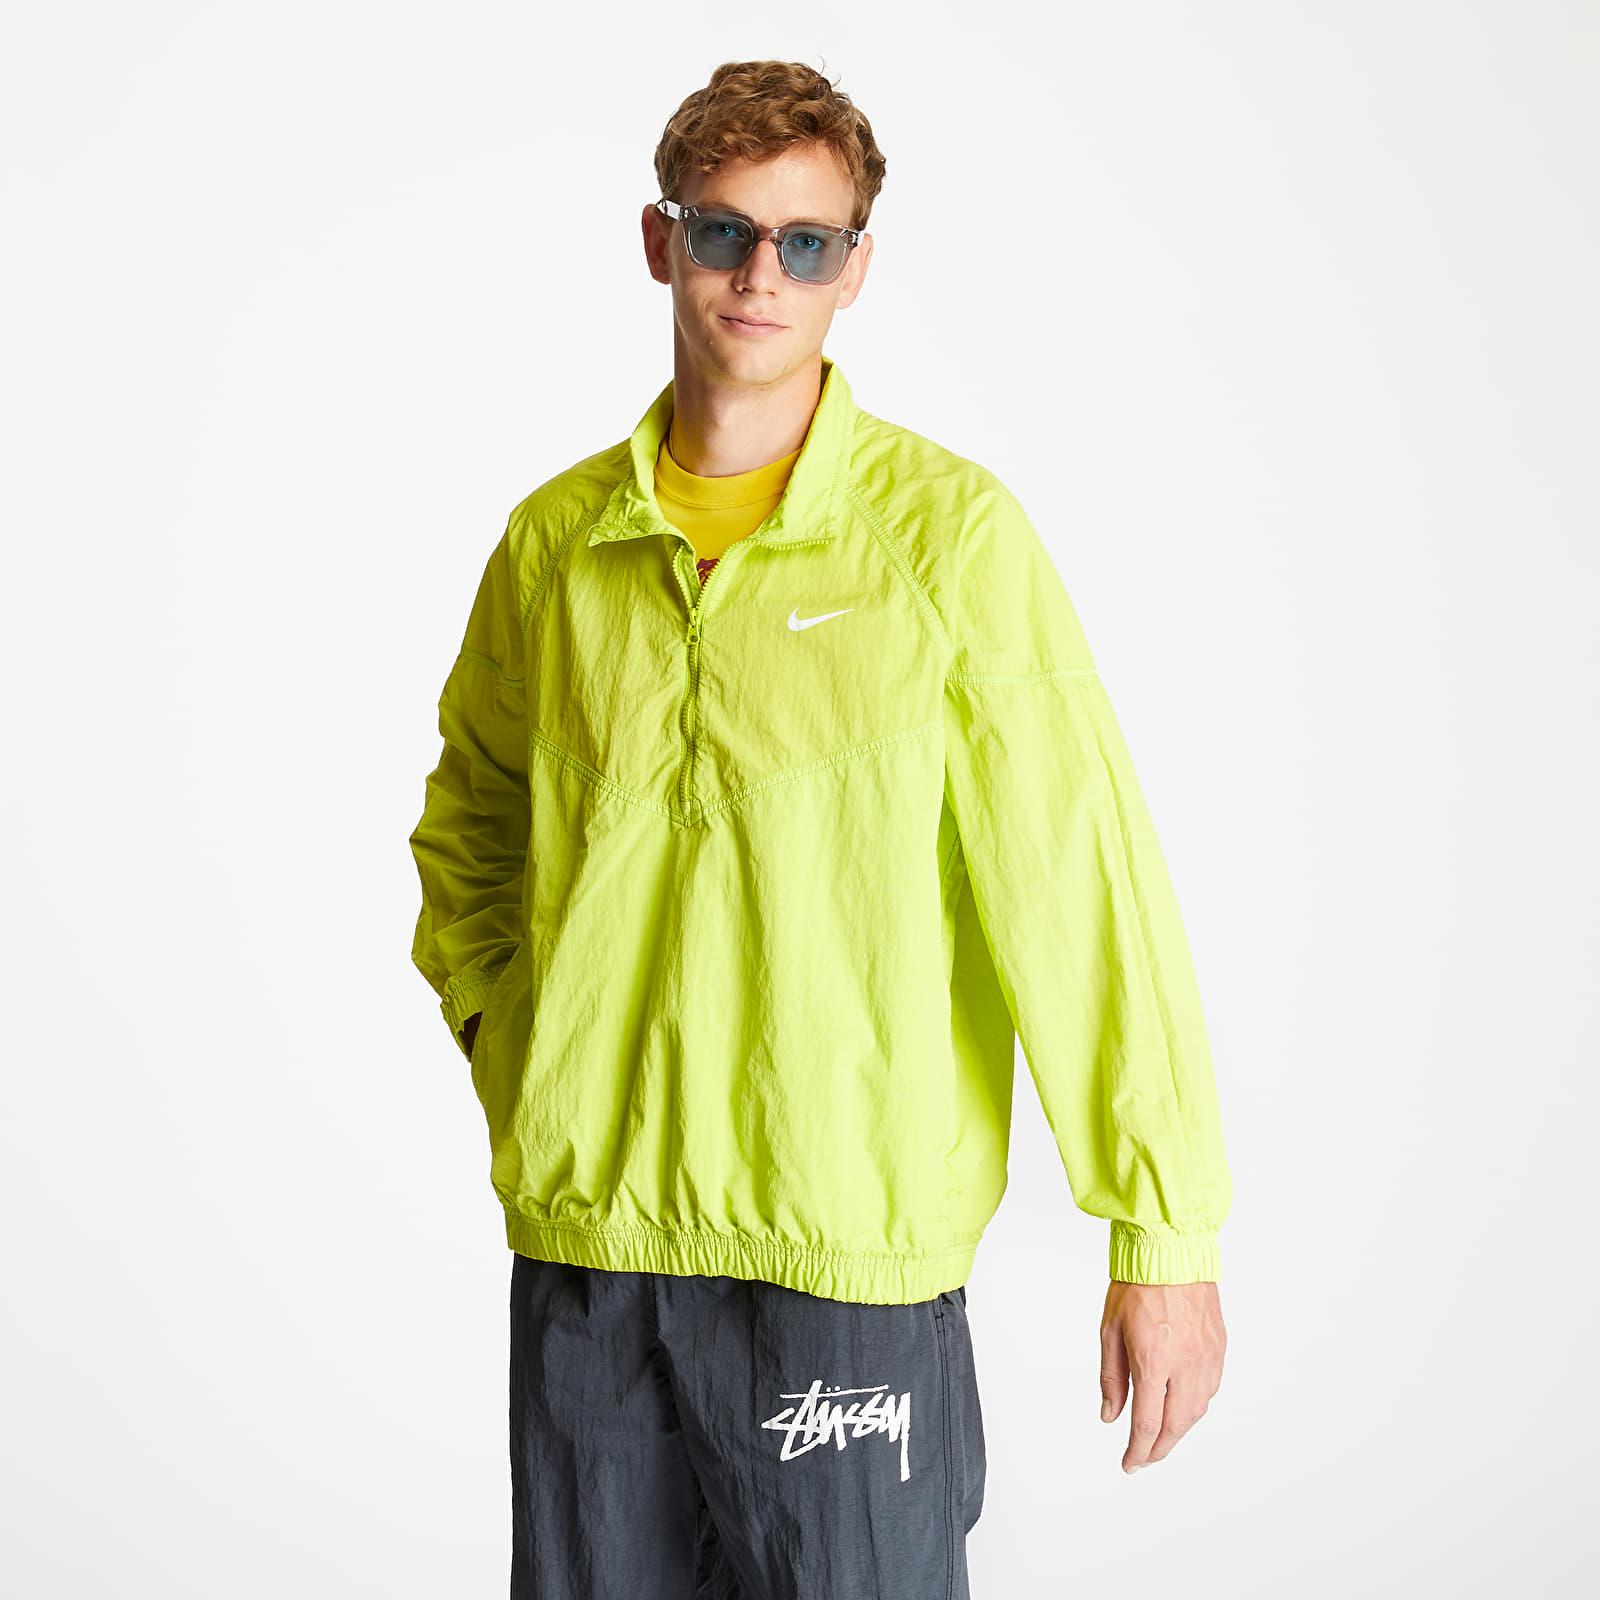 Jacken Nike x Stüssy NRG BR Windrunner Jacket Bright Cactus